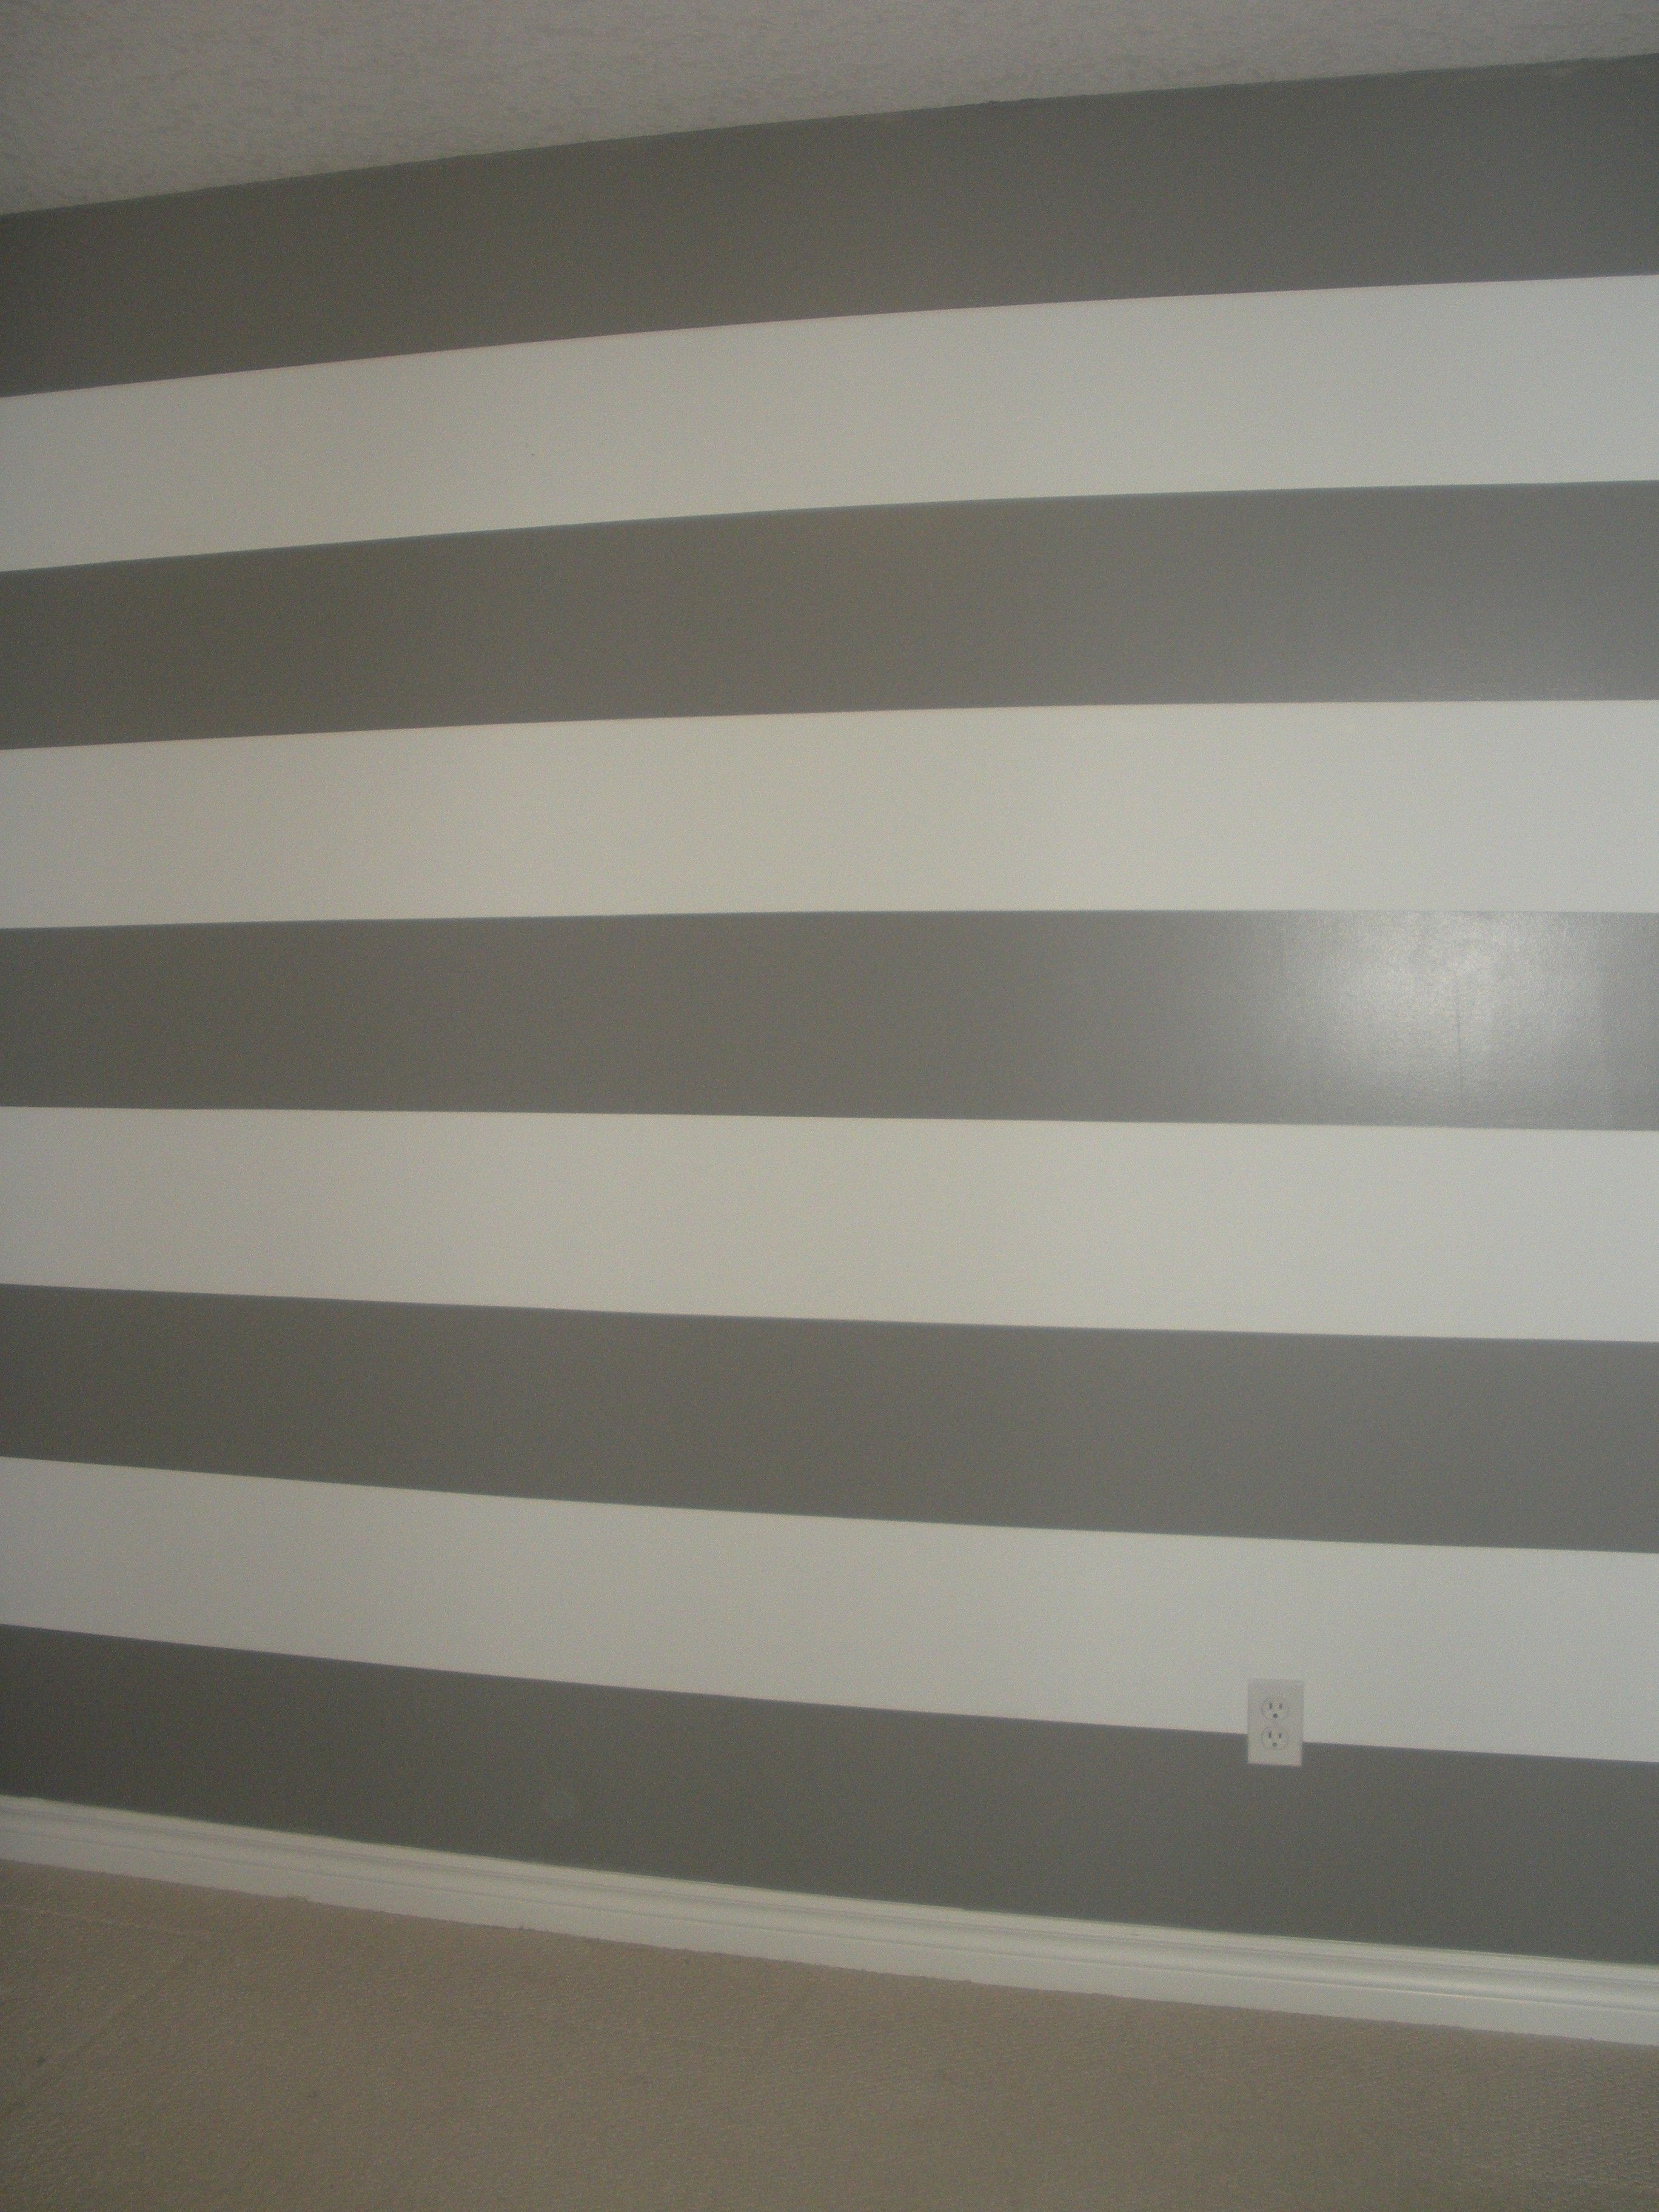 Pin By Sarah Thomas On Baby Boy S Nursery Room Paint Designs Striped Bathroom Walls White Wall Bedroom